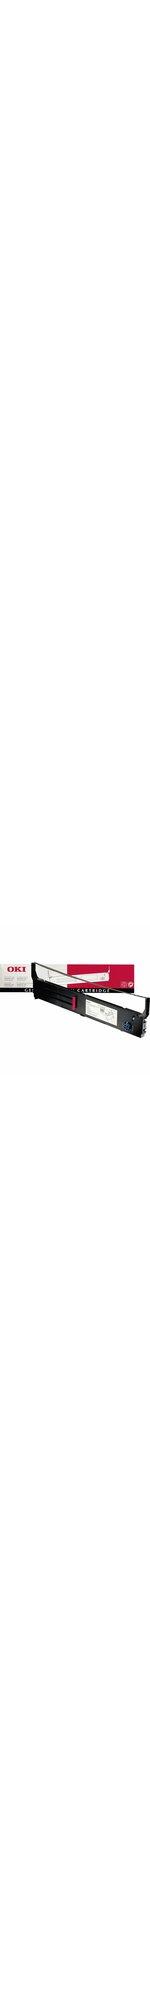 Oki 40629303 Ribbon Cartridge - Black